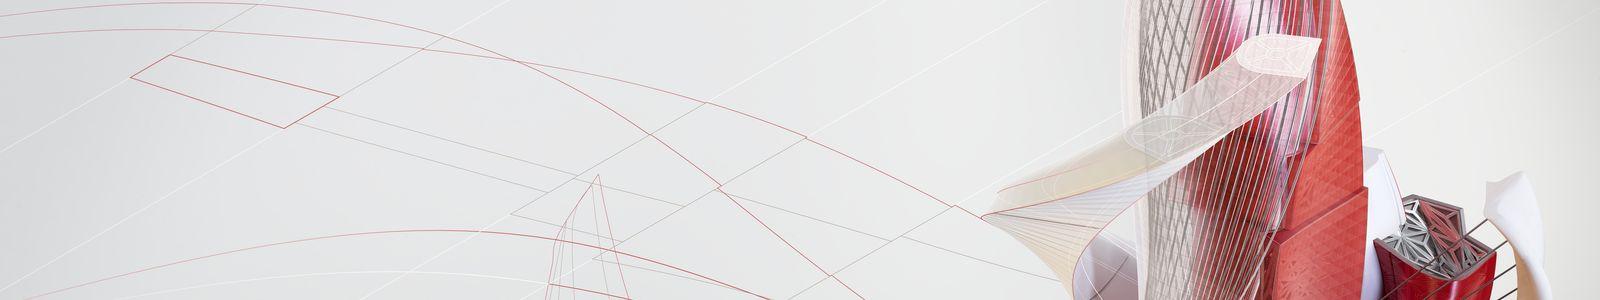 Autodesk AutoCAD LT 2020 | IMAGINiT